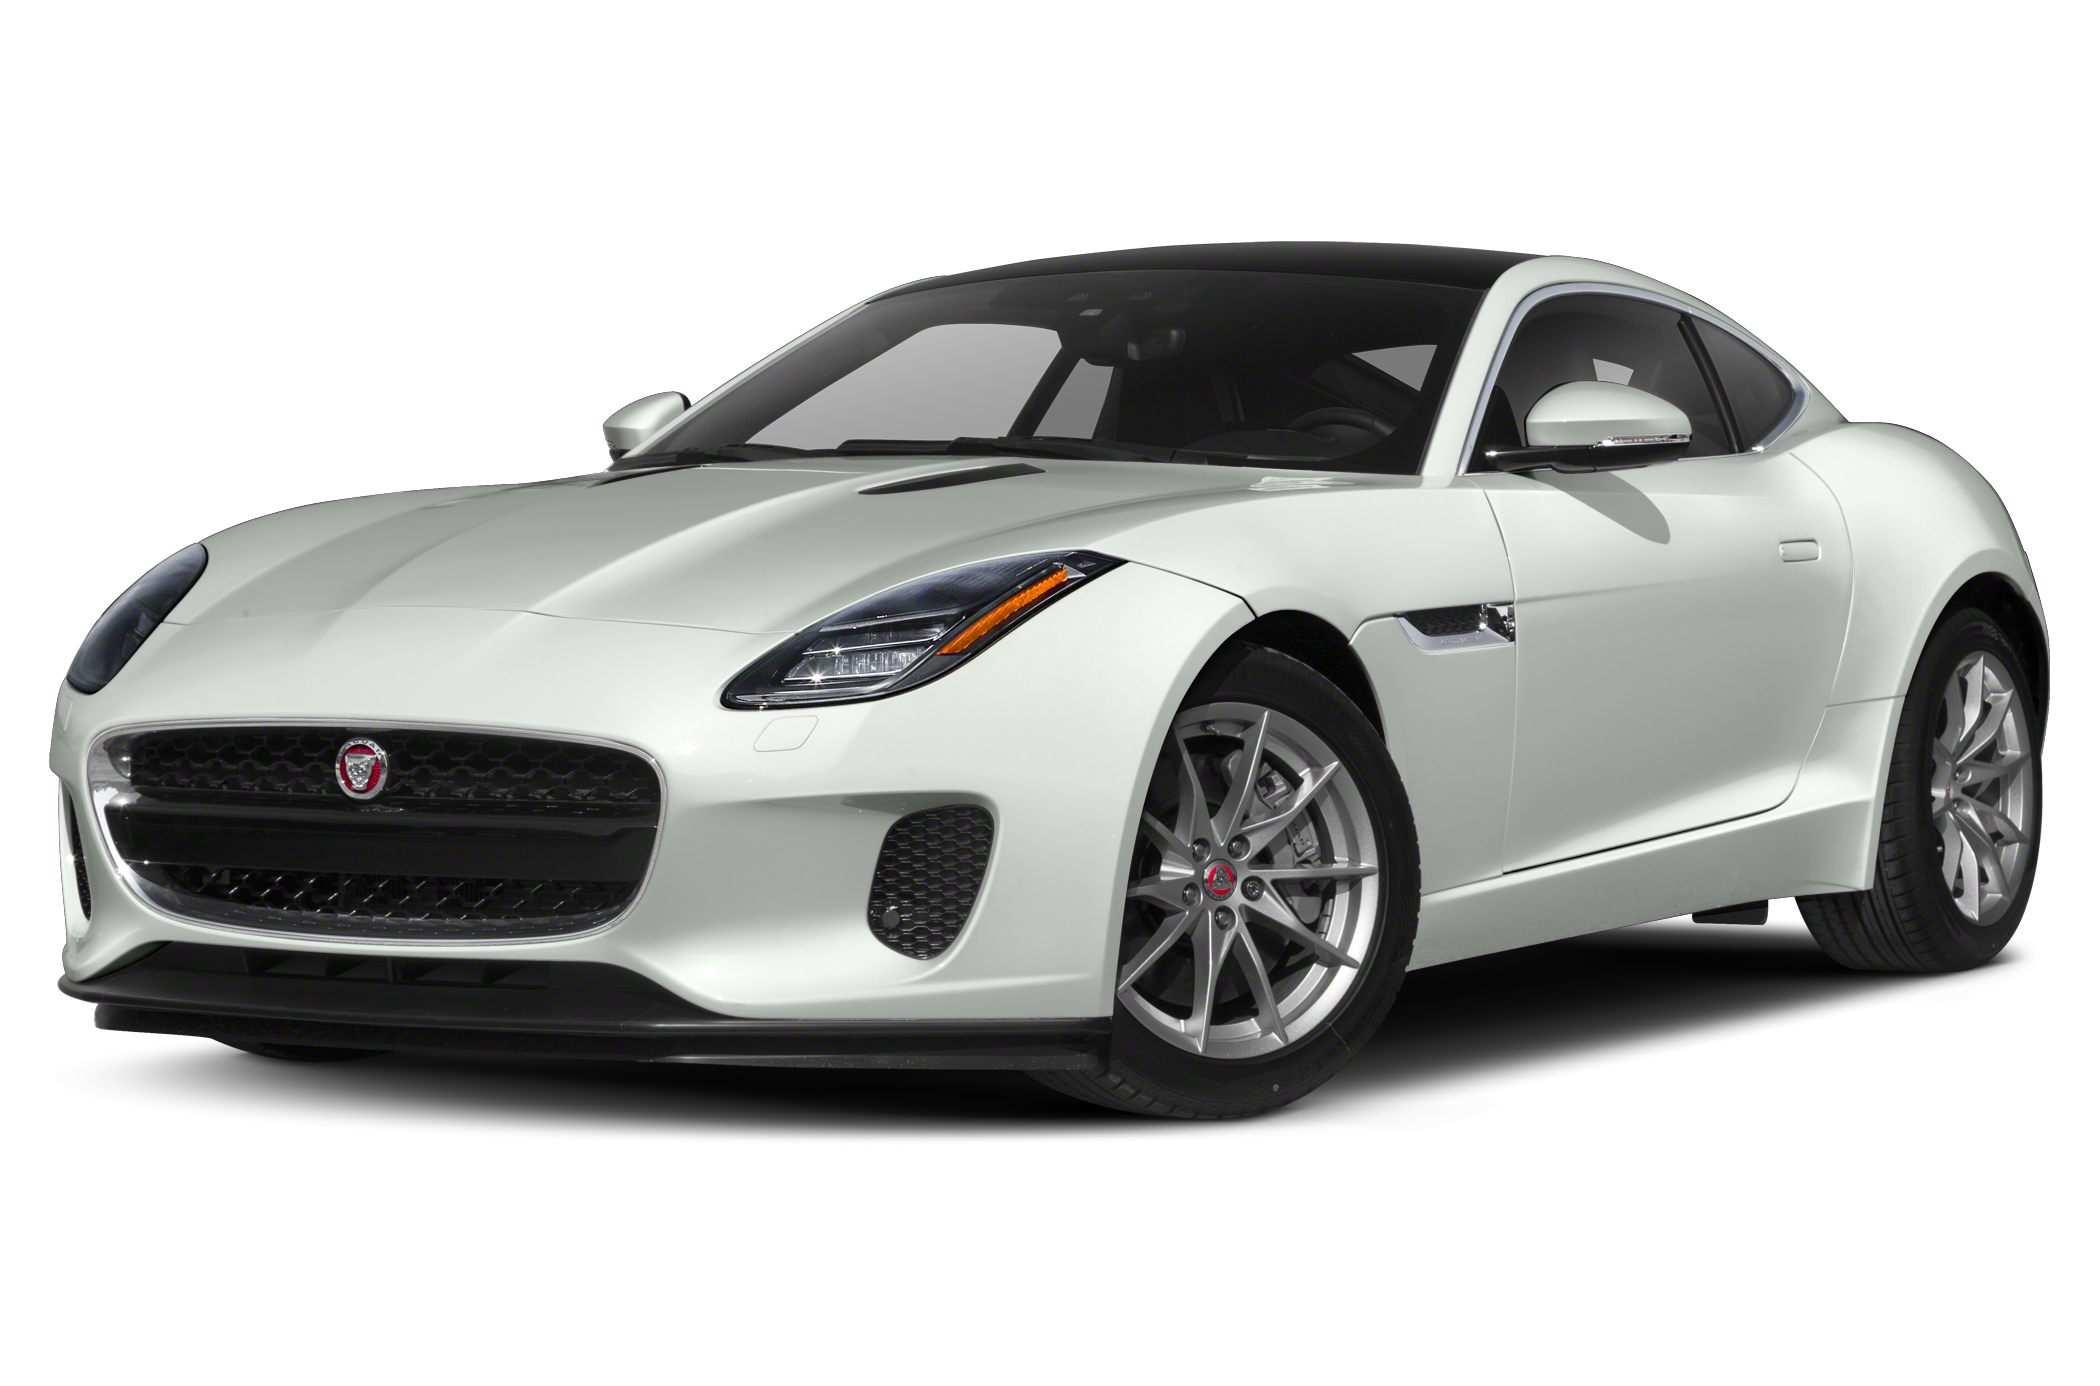 83 Concept of Jaguar Sports Car 2020 Price with Jaguar Sports Car 2020